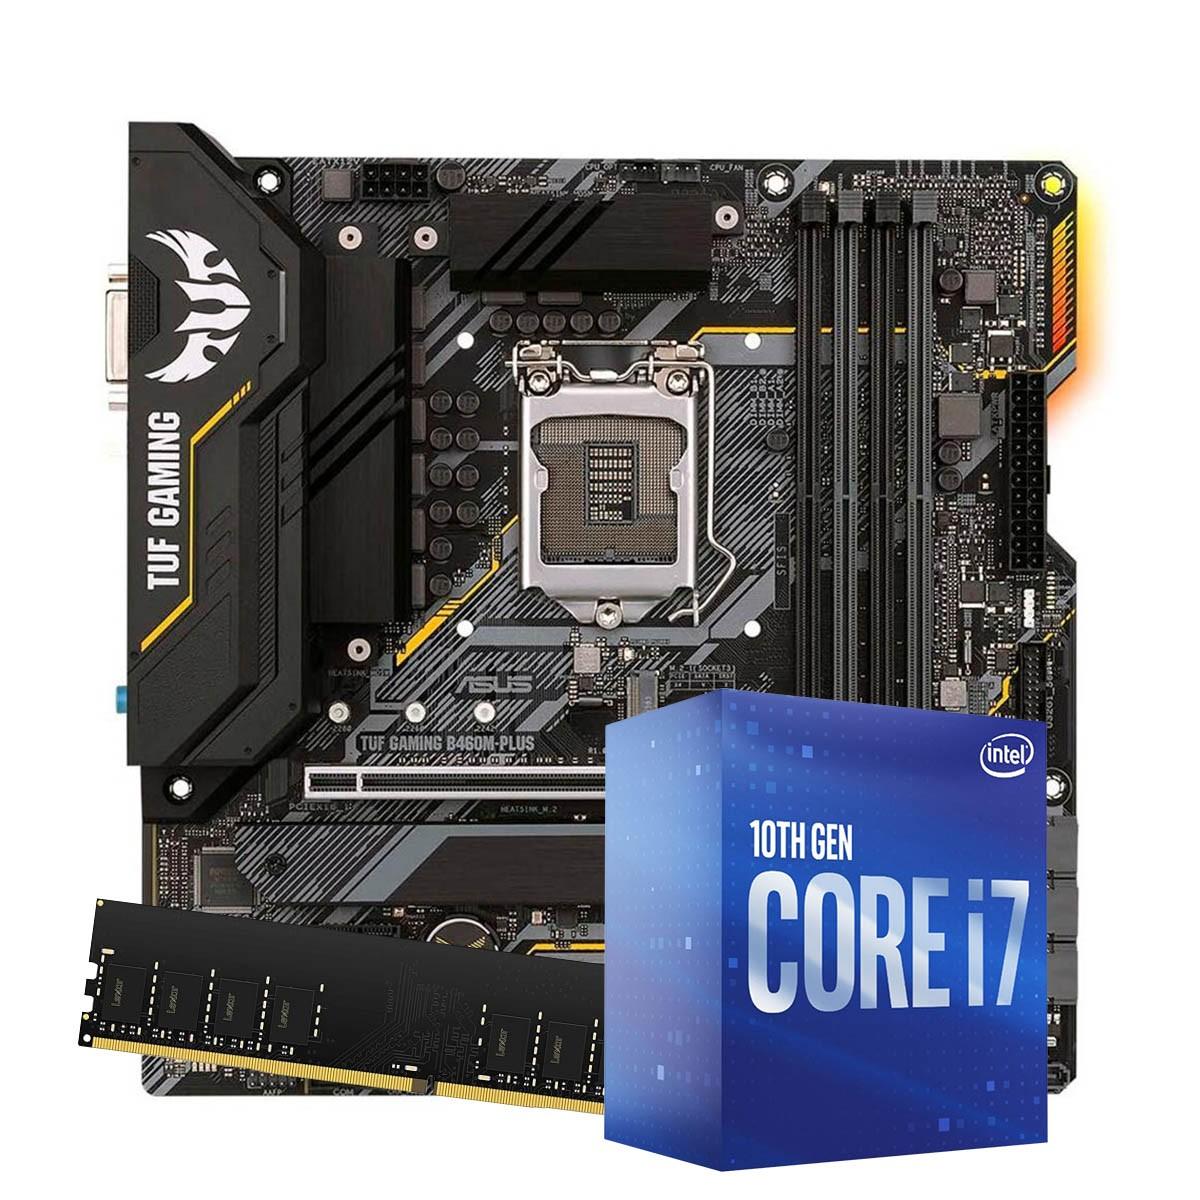 Kit Upgrade intel 10º geração Core i7-10700 2.9ghz ,Placa Mãe Asus TUF gaming B460M-Plus LGA 1200, 8GB DDR4